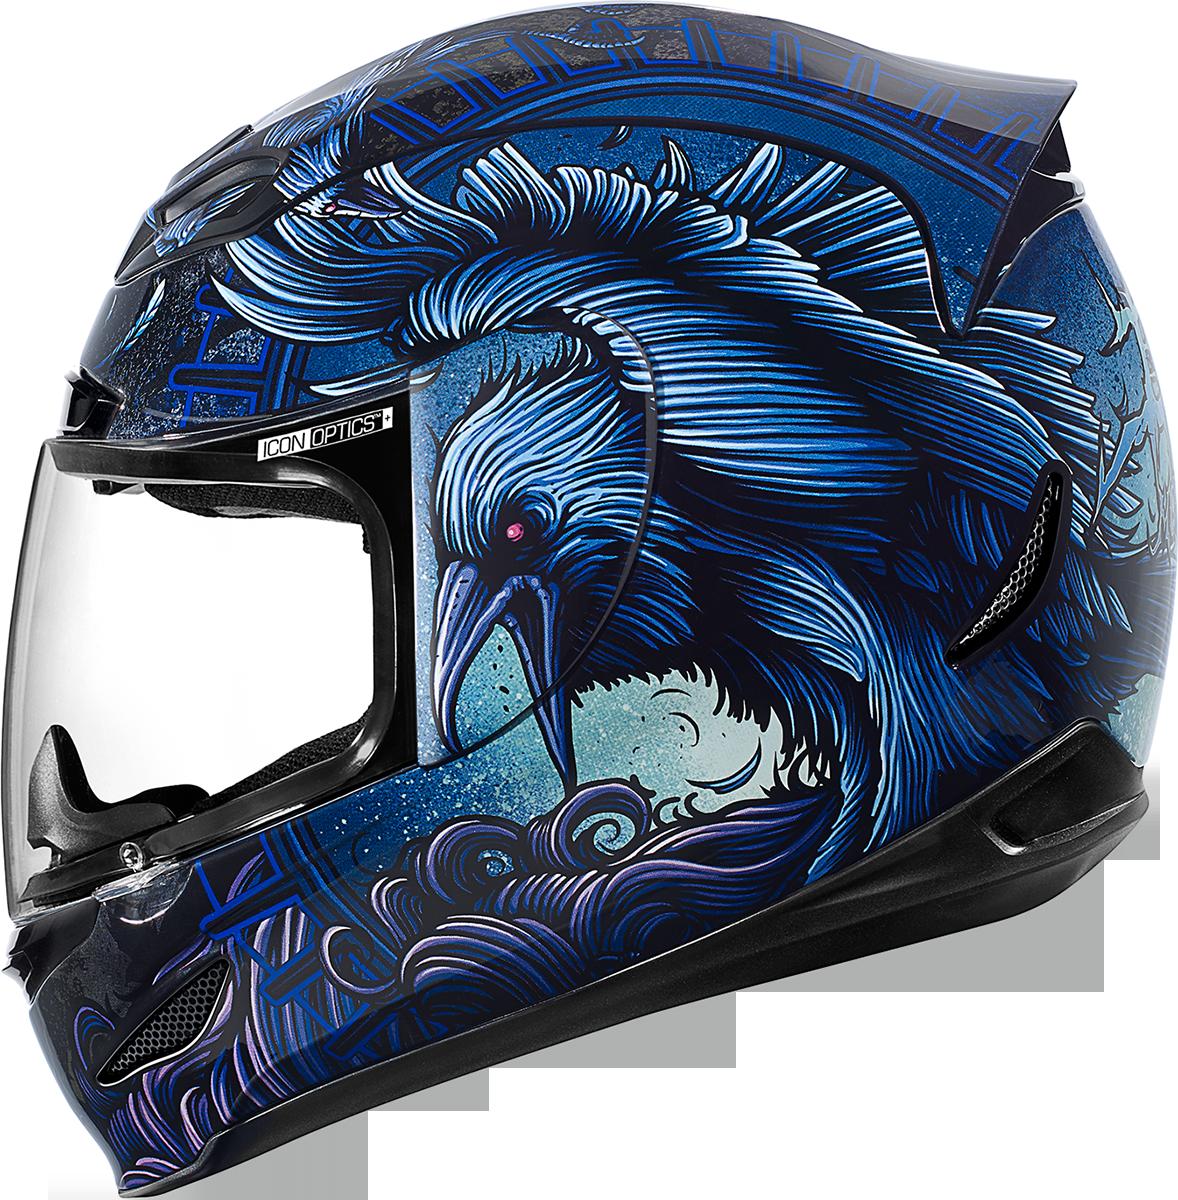 Airmada Ravenous Black Products Ride Icon